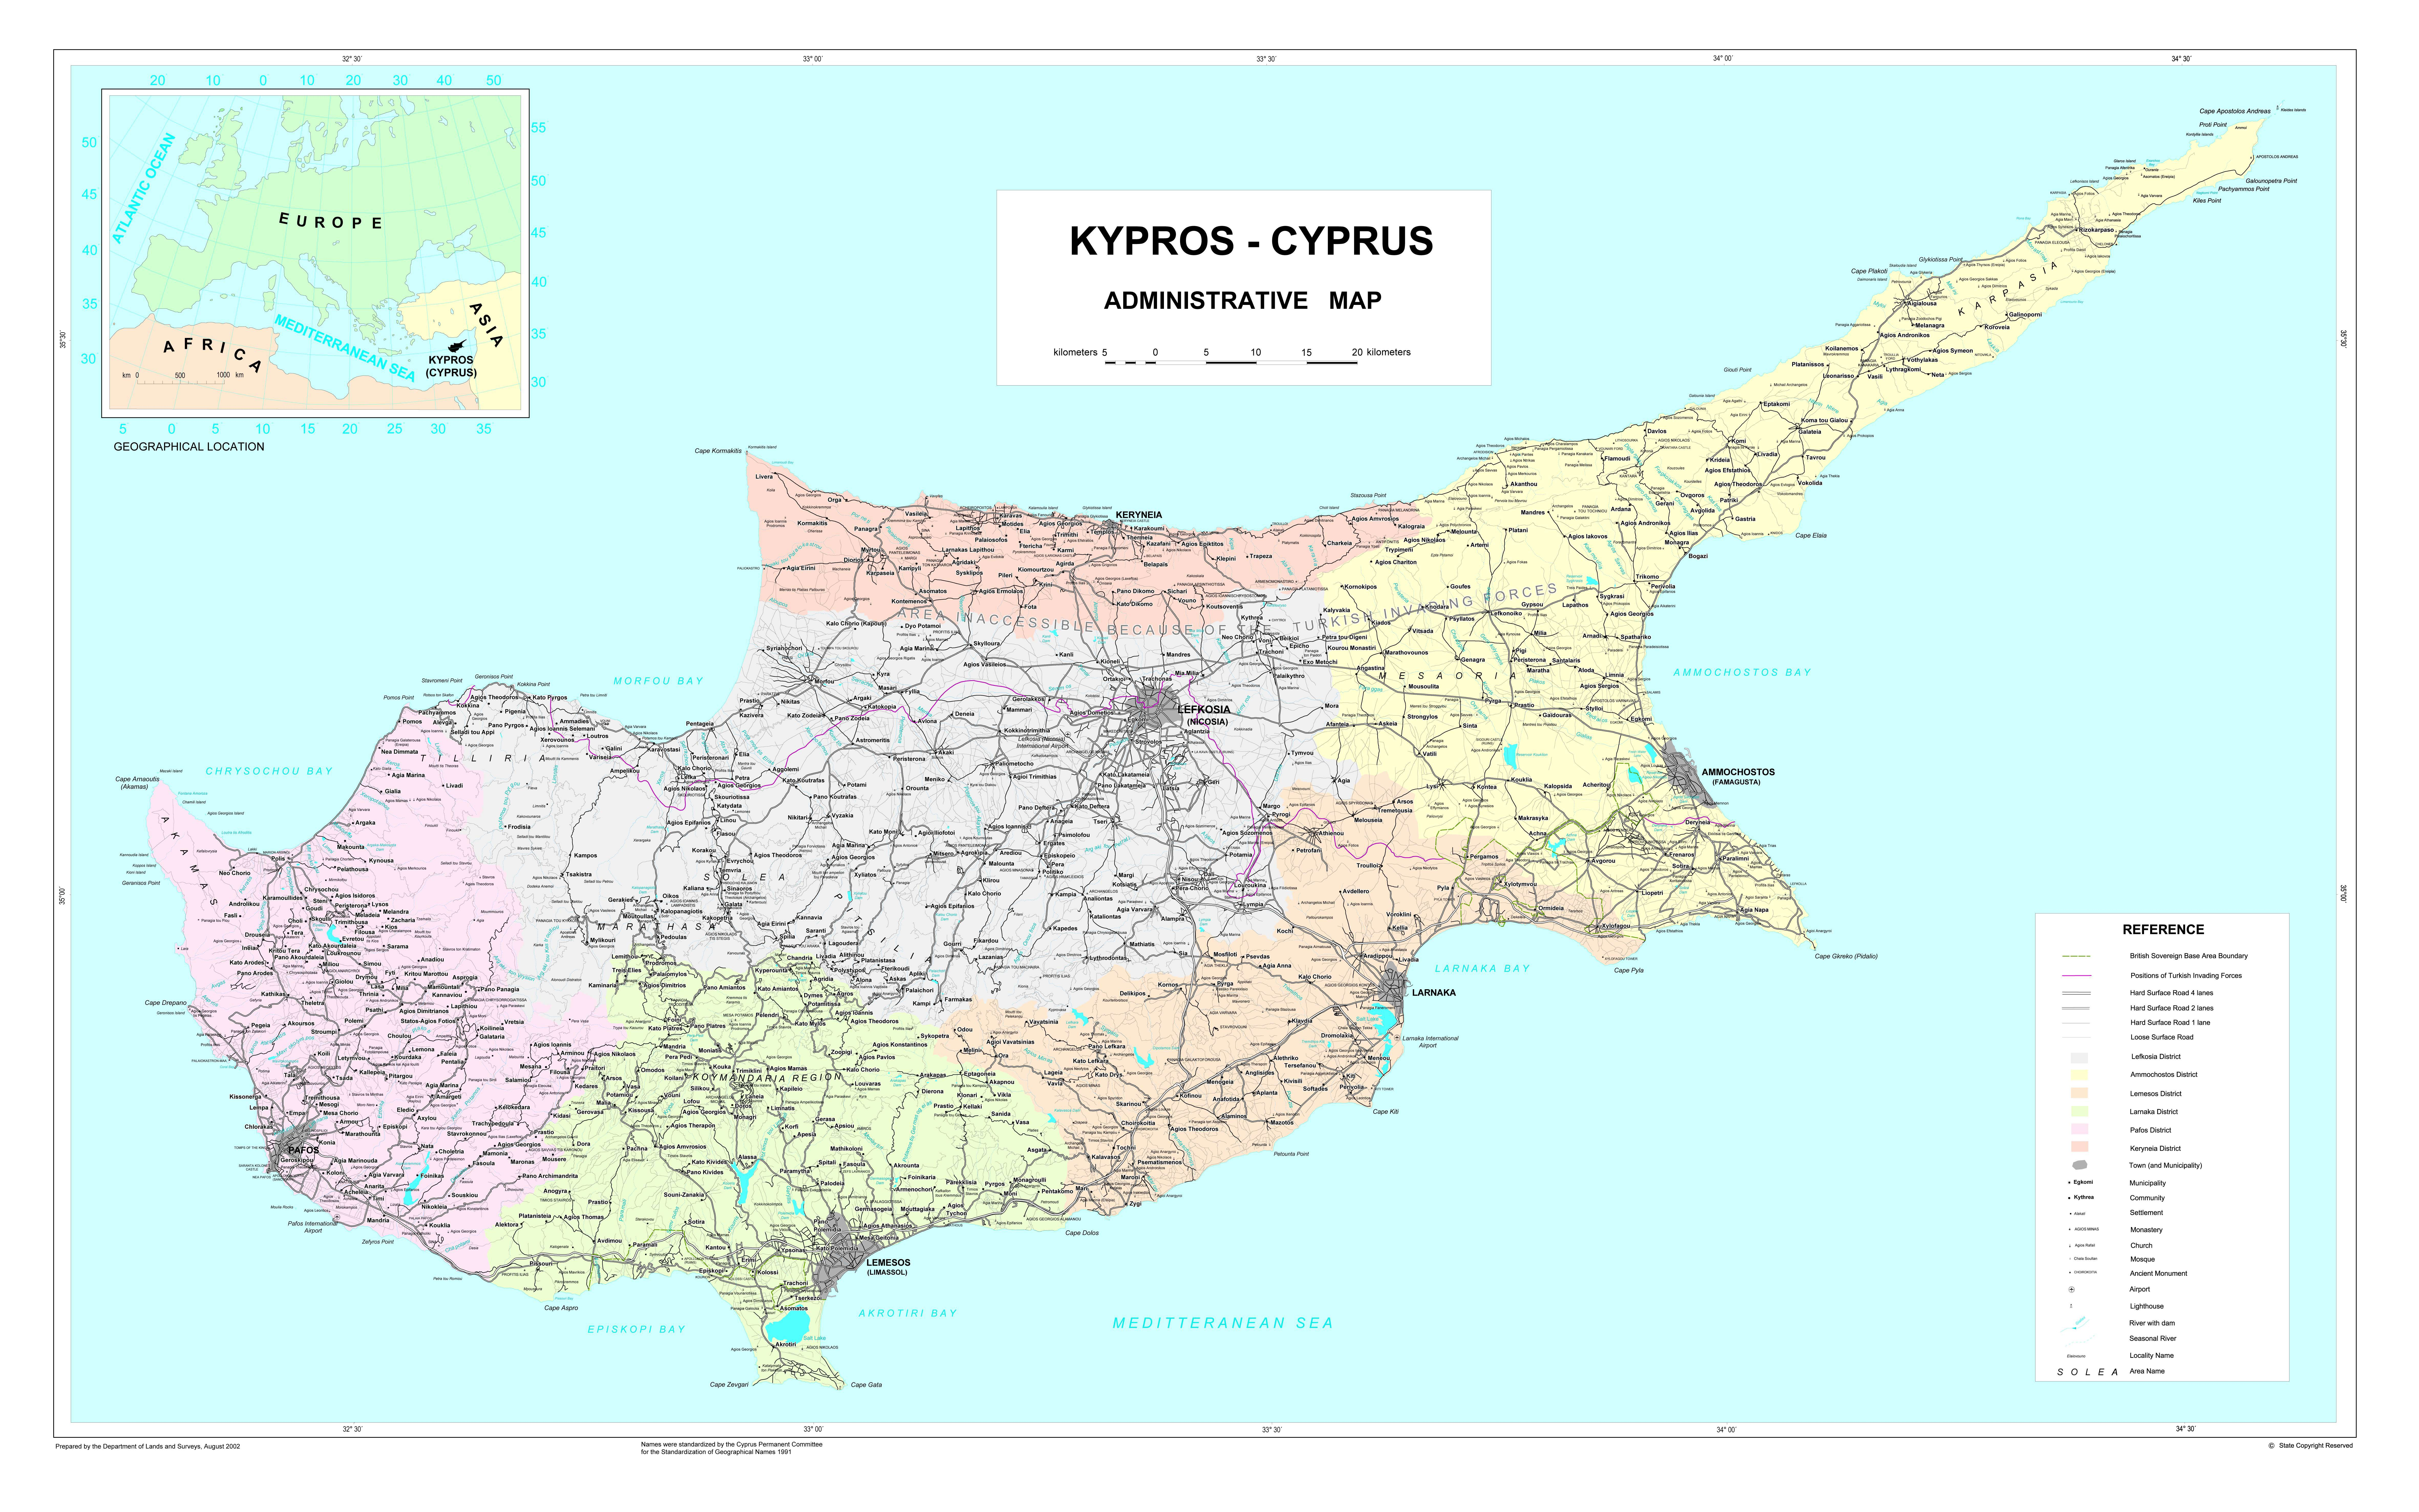 Kypr Mapa Kypru Ayia Napa Larnaka Paphos Nikosie Limassol